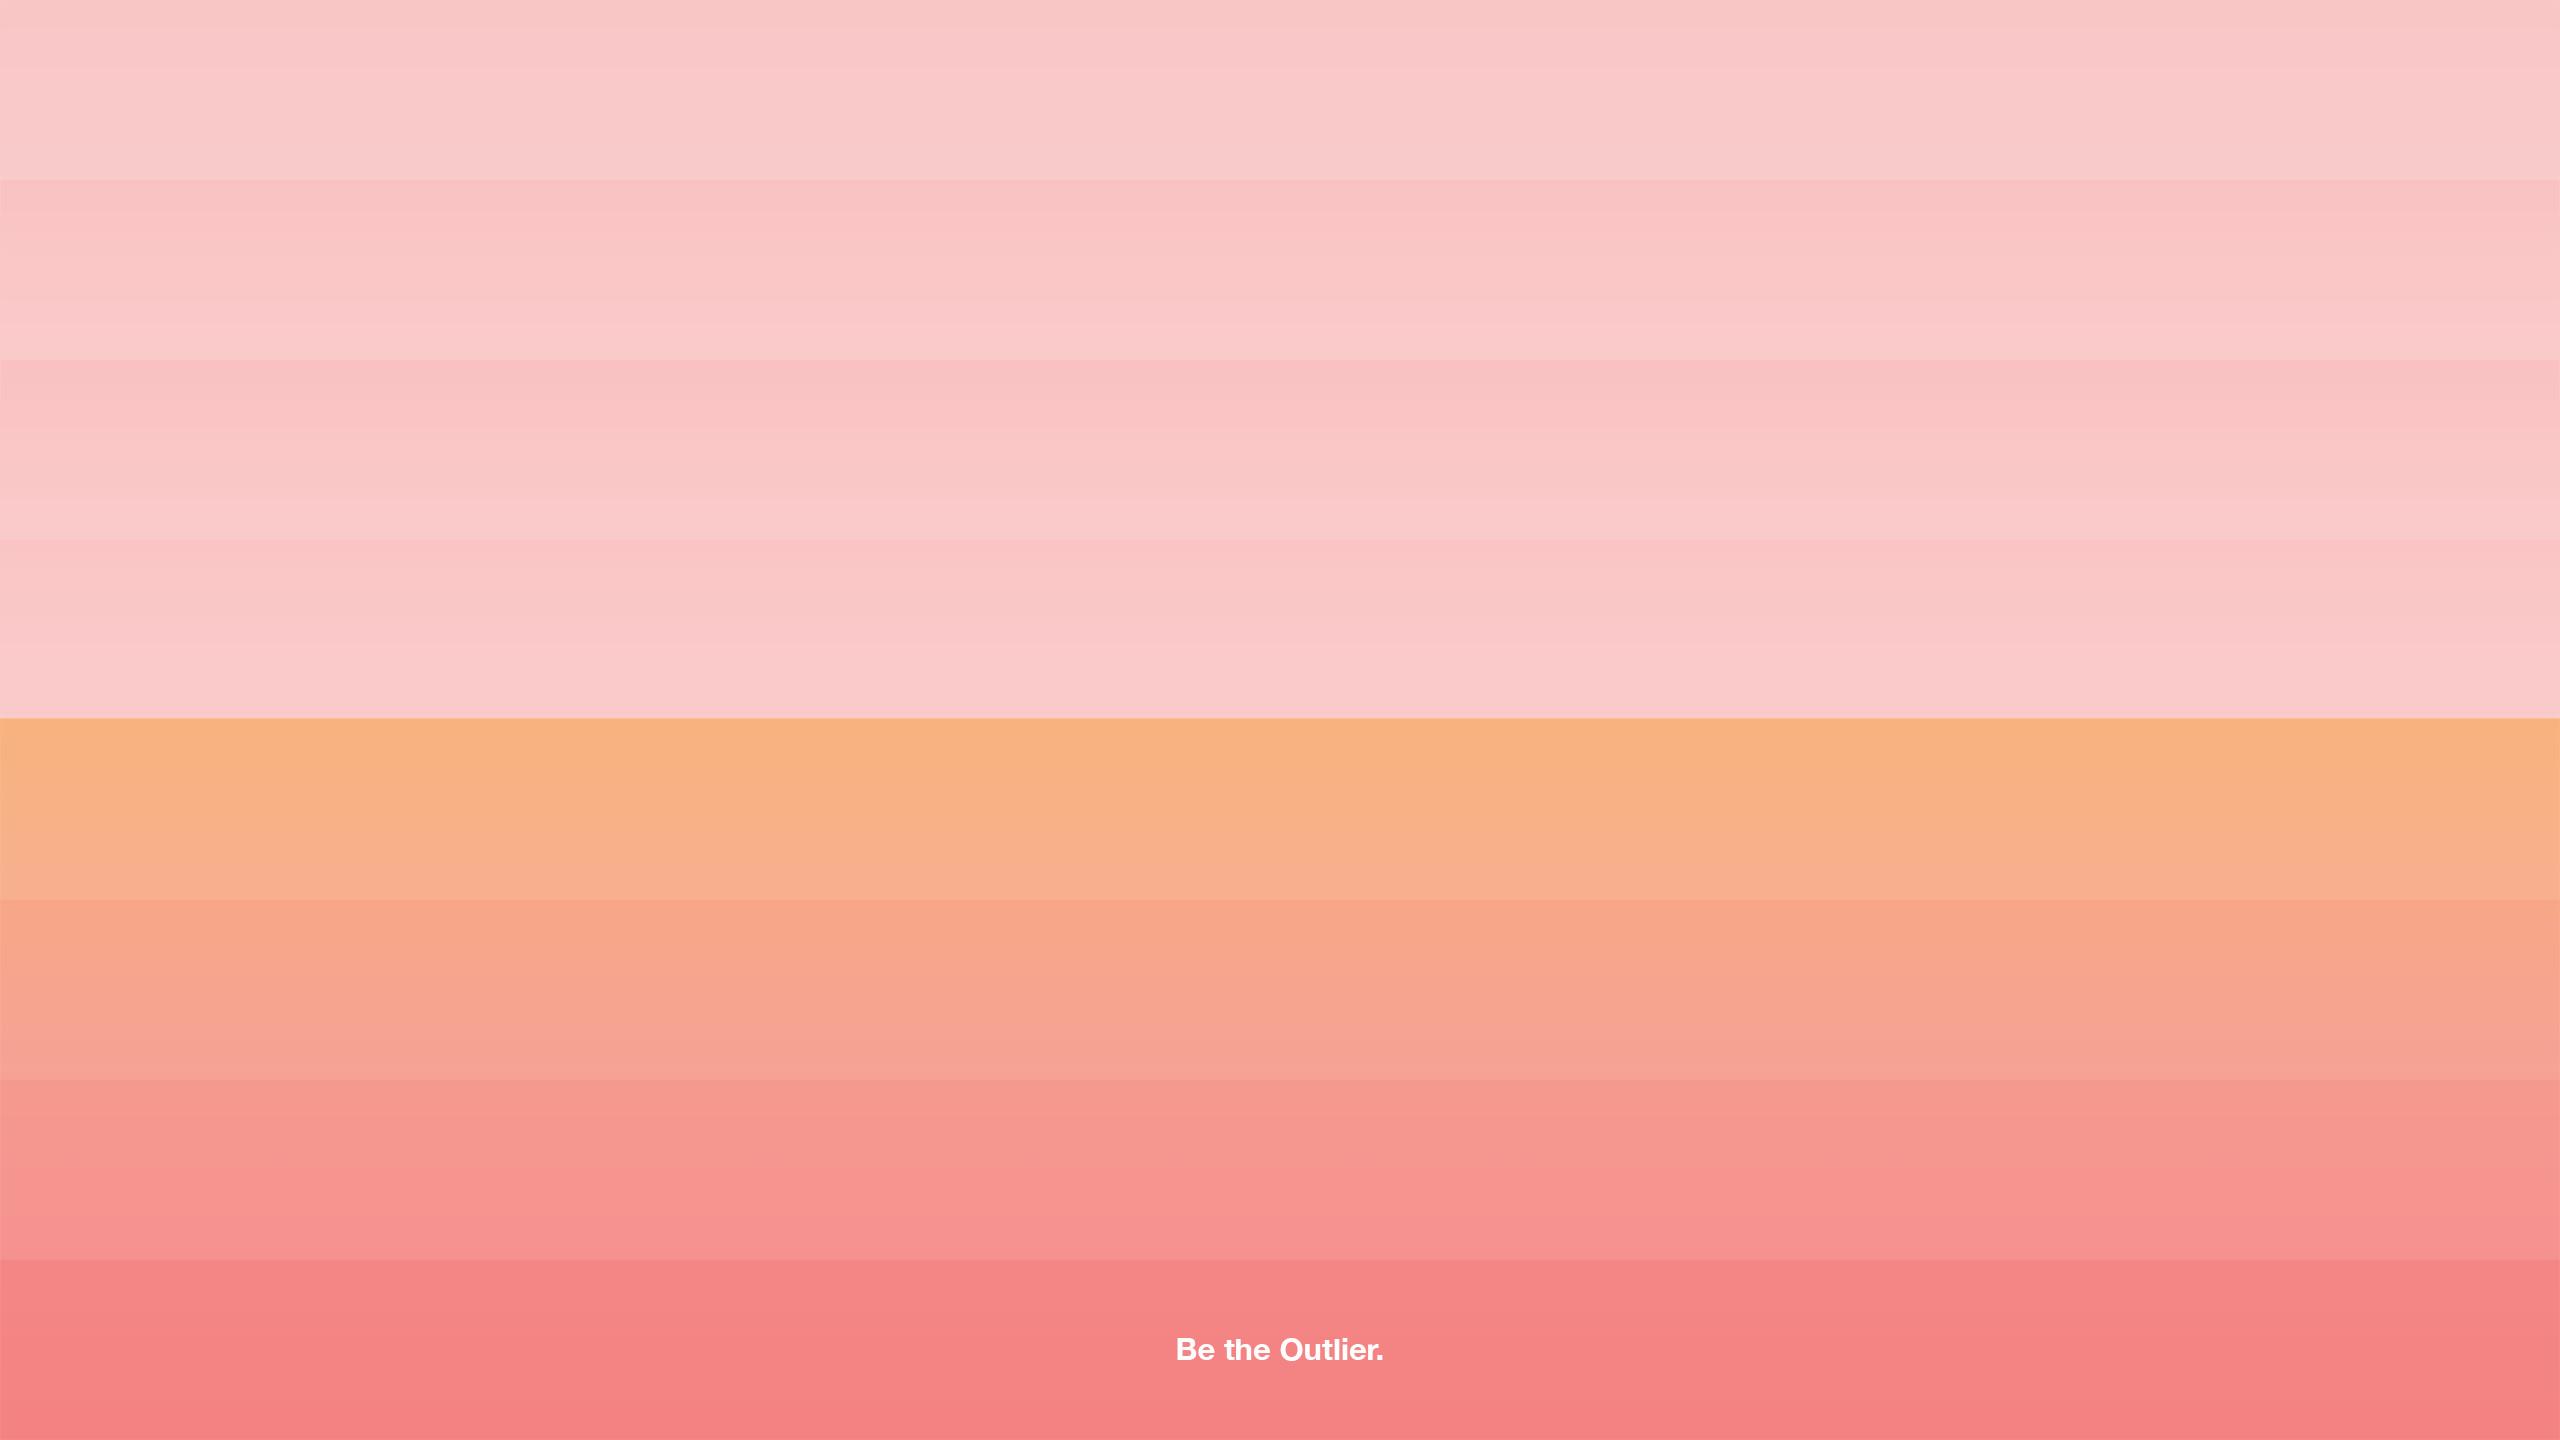 Pink Aesthetic Wallpaper Desktop Hd